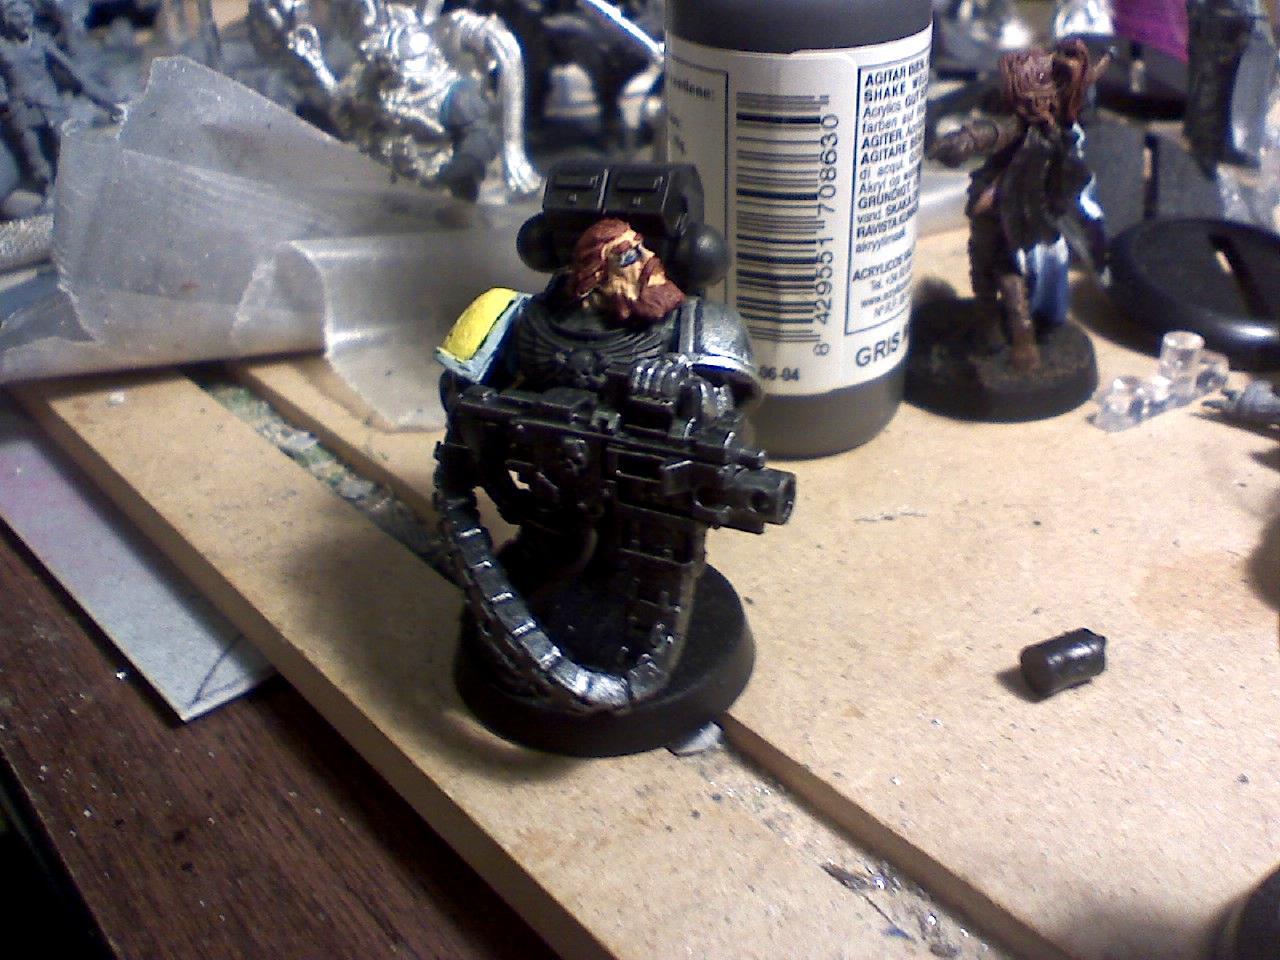 Black, Deathwatch, Devastator, Heavy Bolter, Infantry, Power Armor, Silver, Space Marines, Space Wolves, Warhammer 40,000, Work In Progress